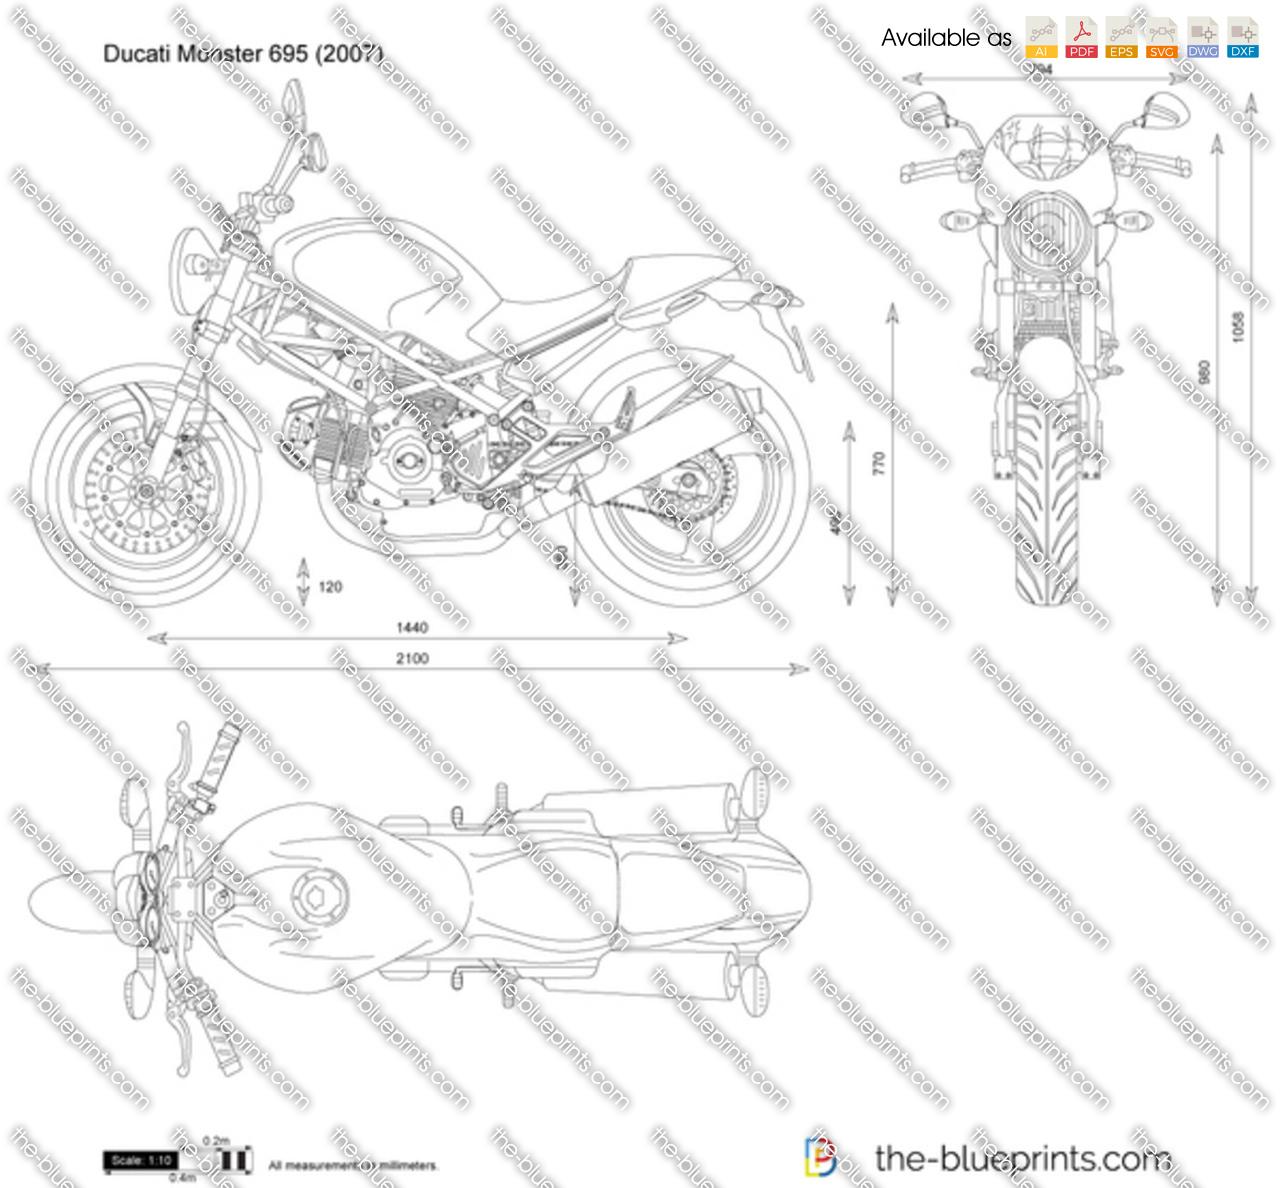 Ducati Monster 695 vector drawing